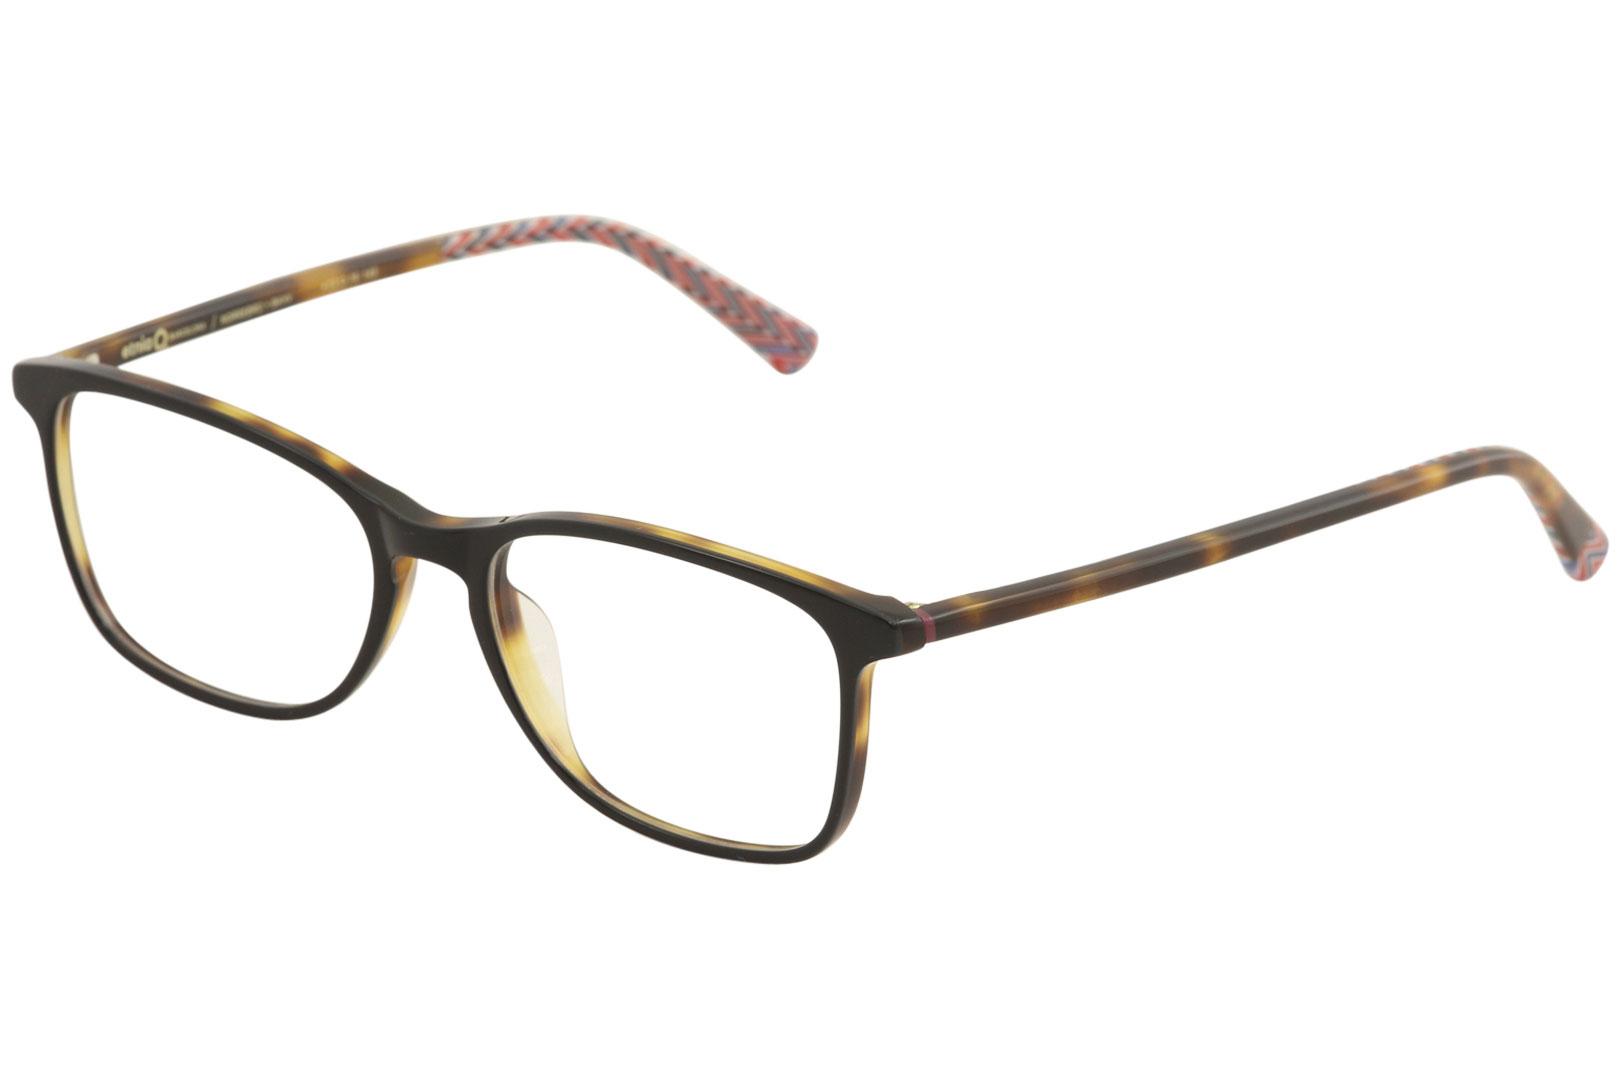 Etnia Barcelona Women s Eyeglasses Norrebro BKHV Black Havana ... 694b4500f9ac